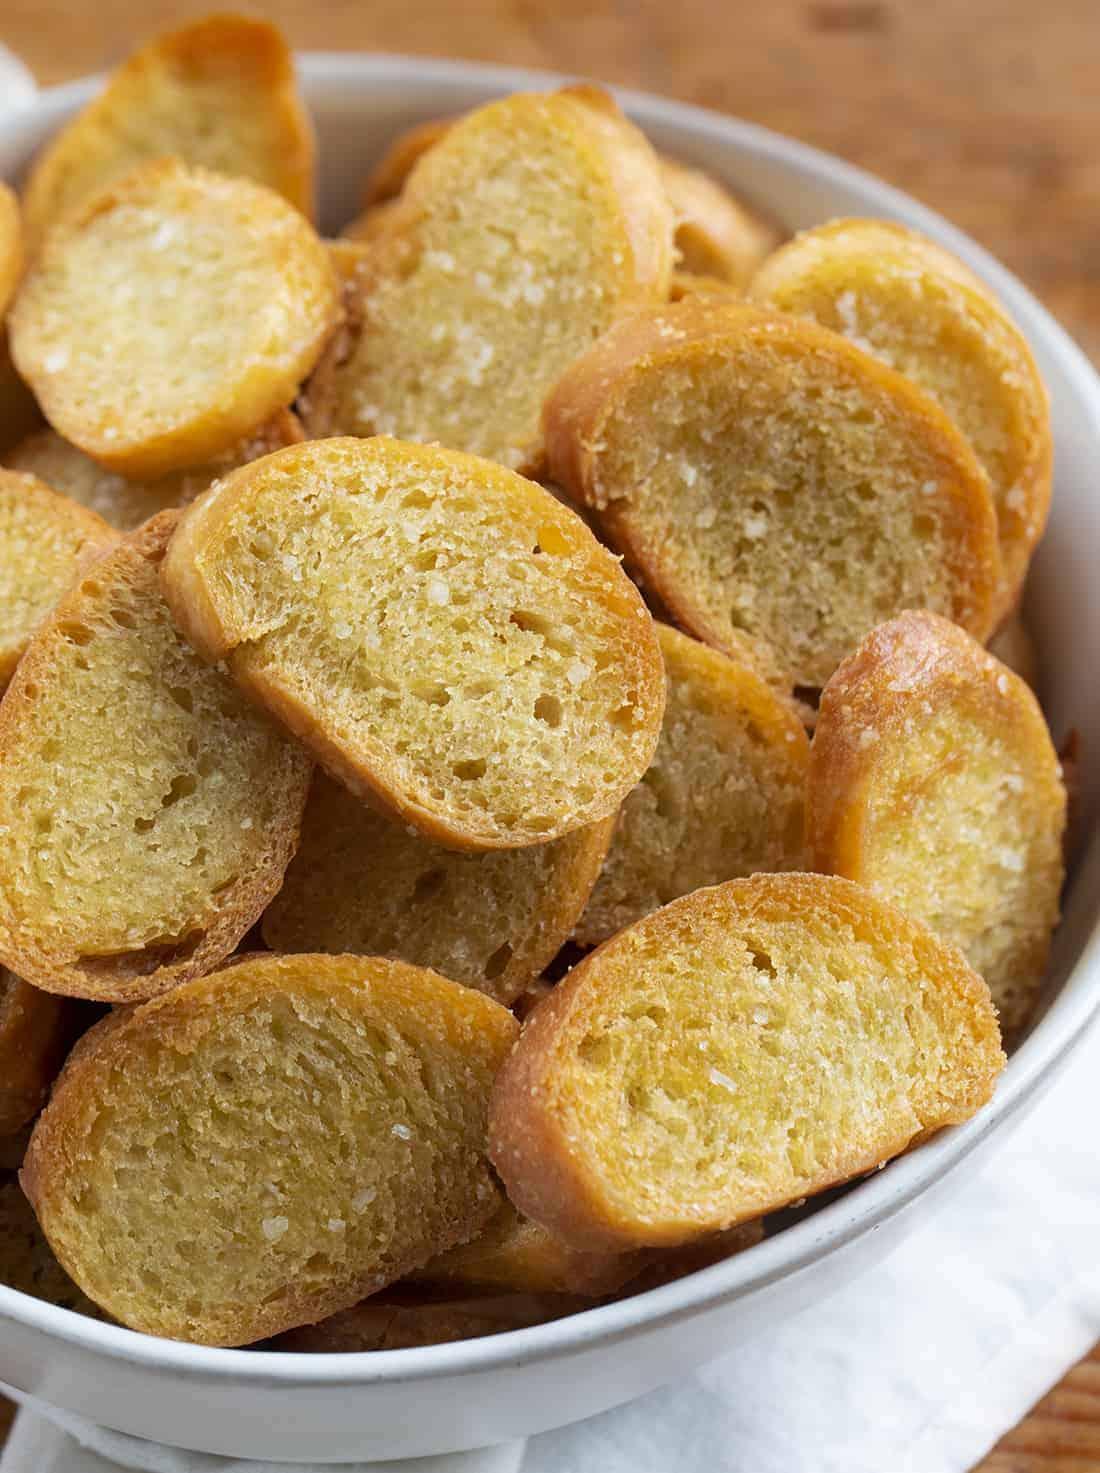 Bowl of Toasted Crostini